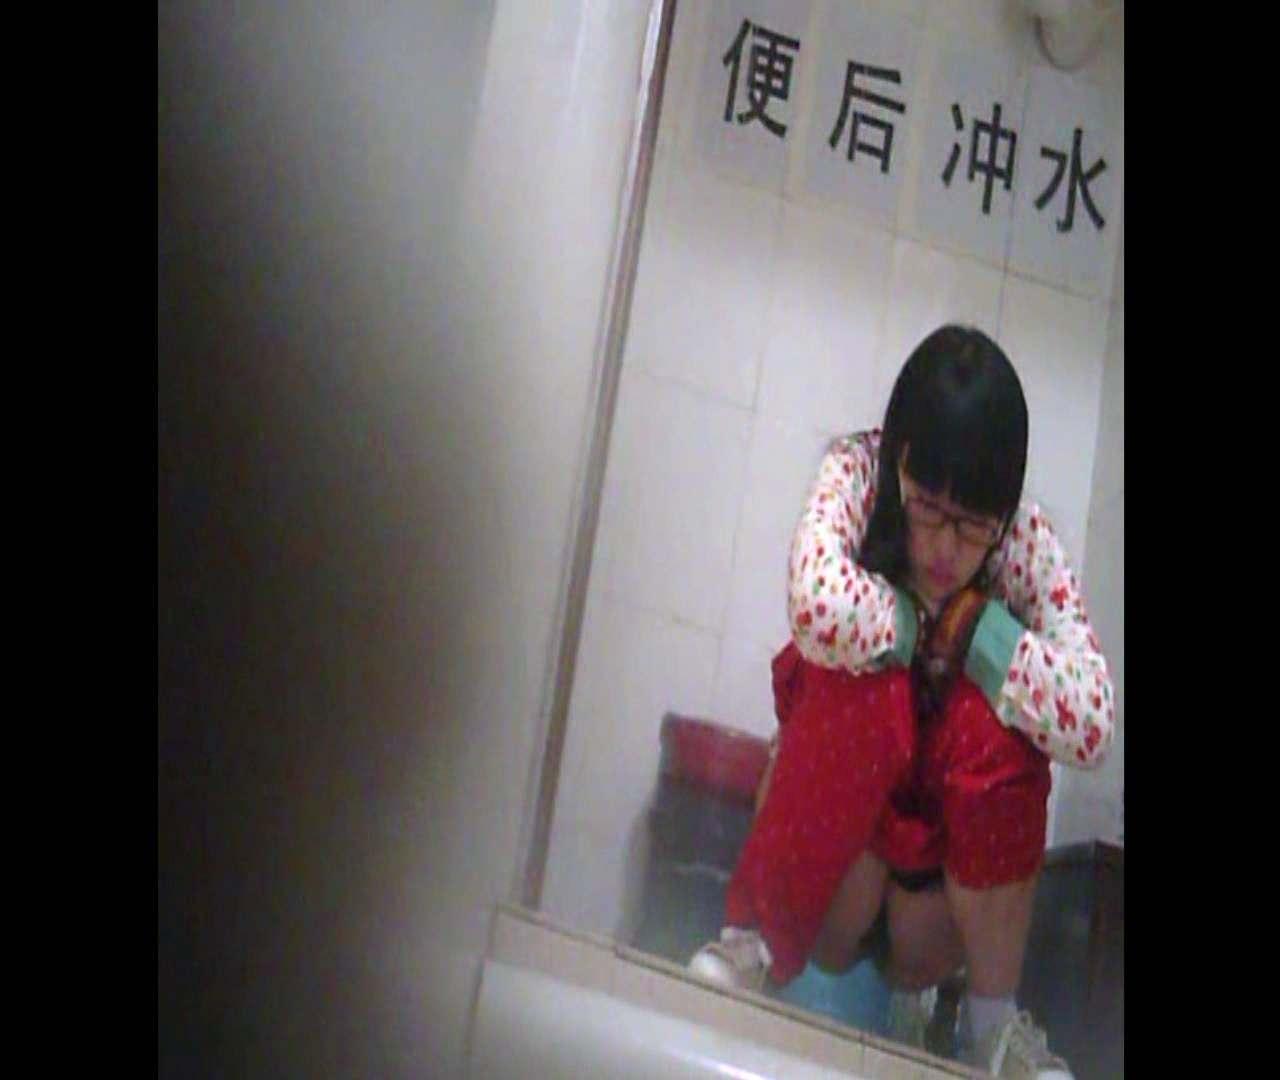 Vol.01 赤のパンツスタイルがとっても眩しい!! パンツ特集 AV無料動画キャプチャ 61画像 26